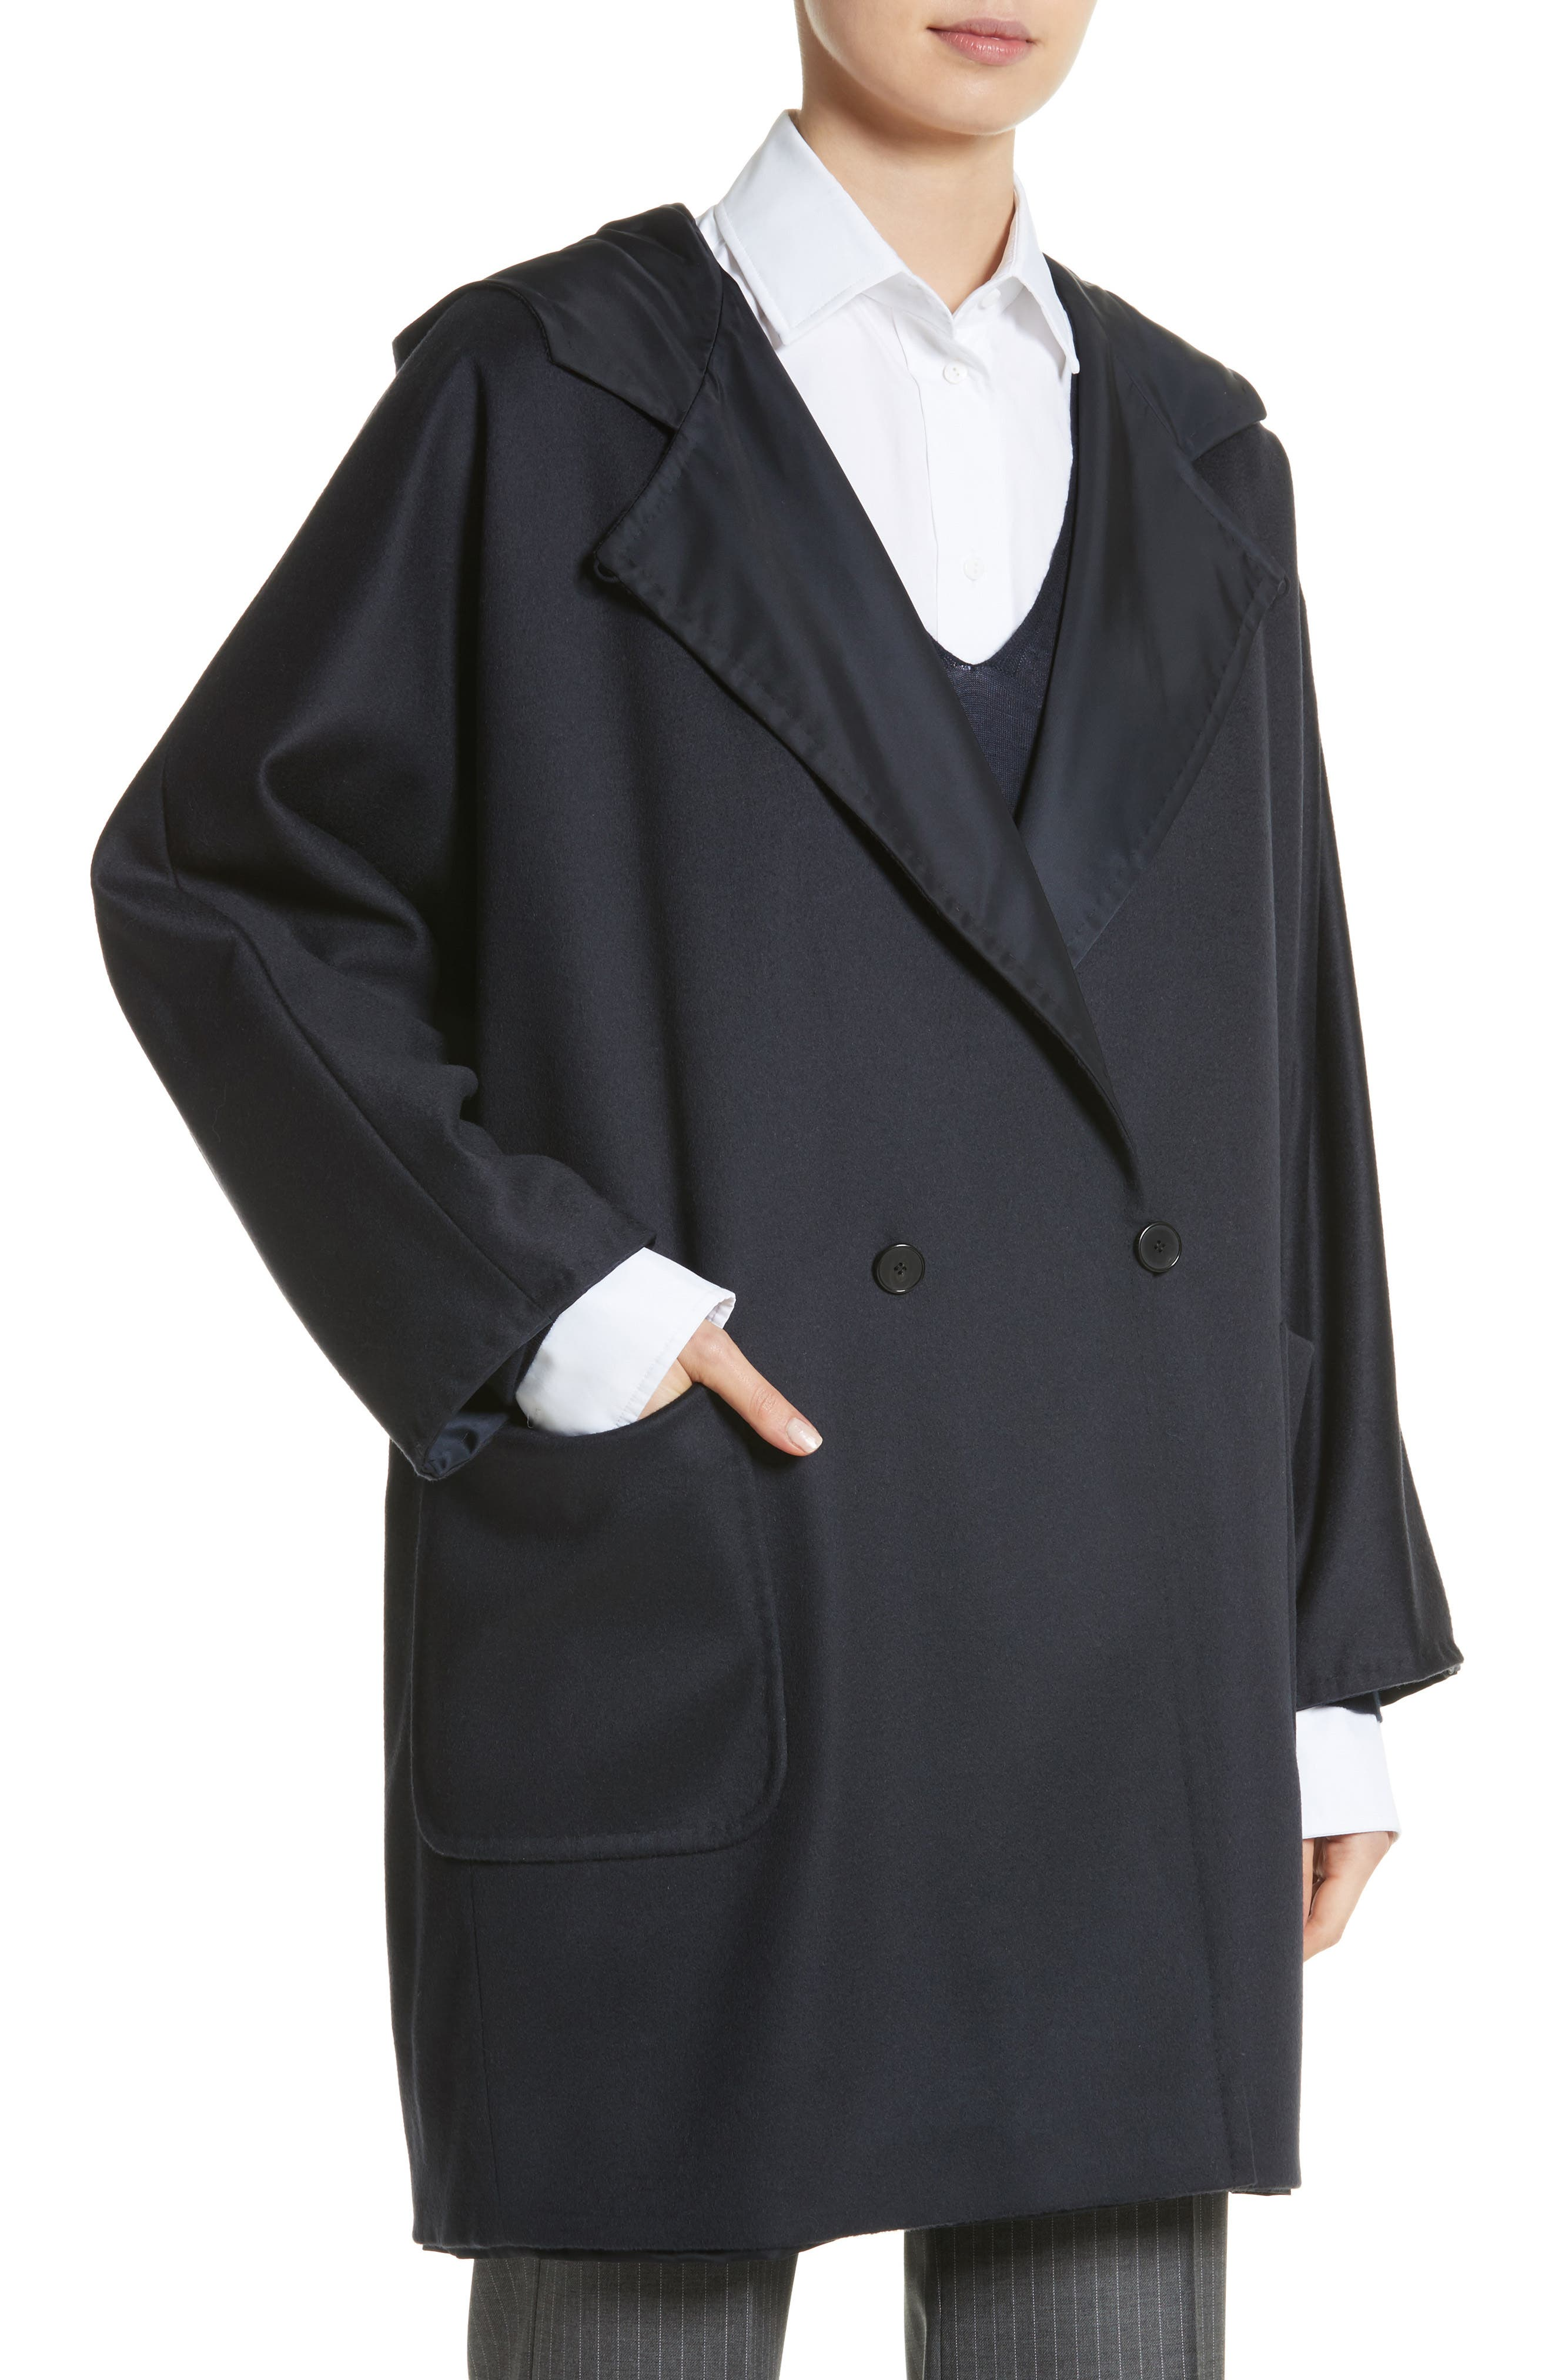 Jacopo Reversible Hooded Coat,                             Alternate thumbnail 2, color,                             411